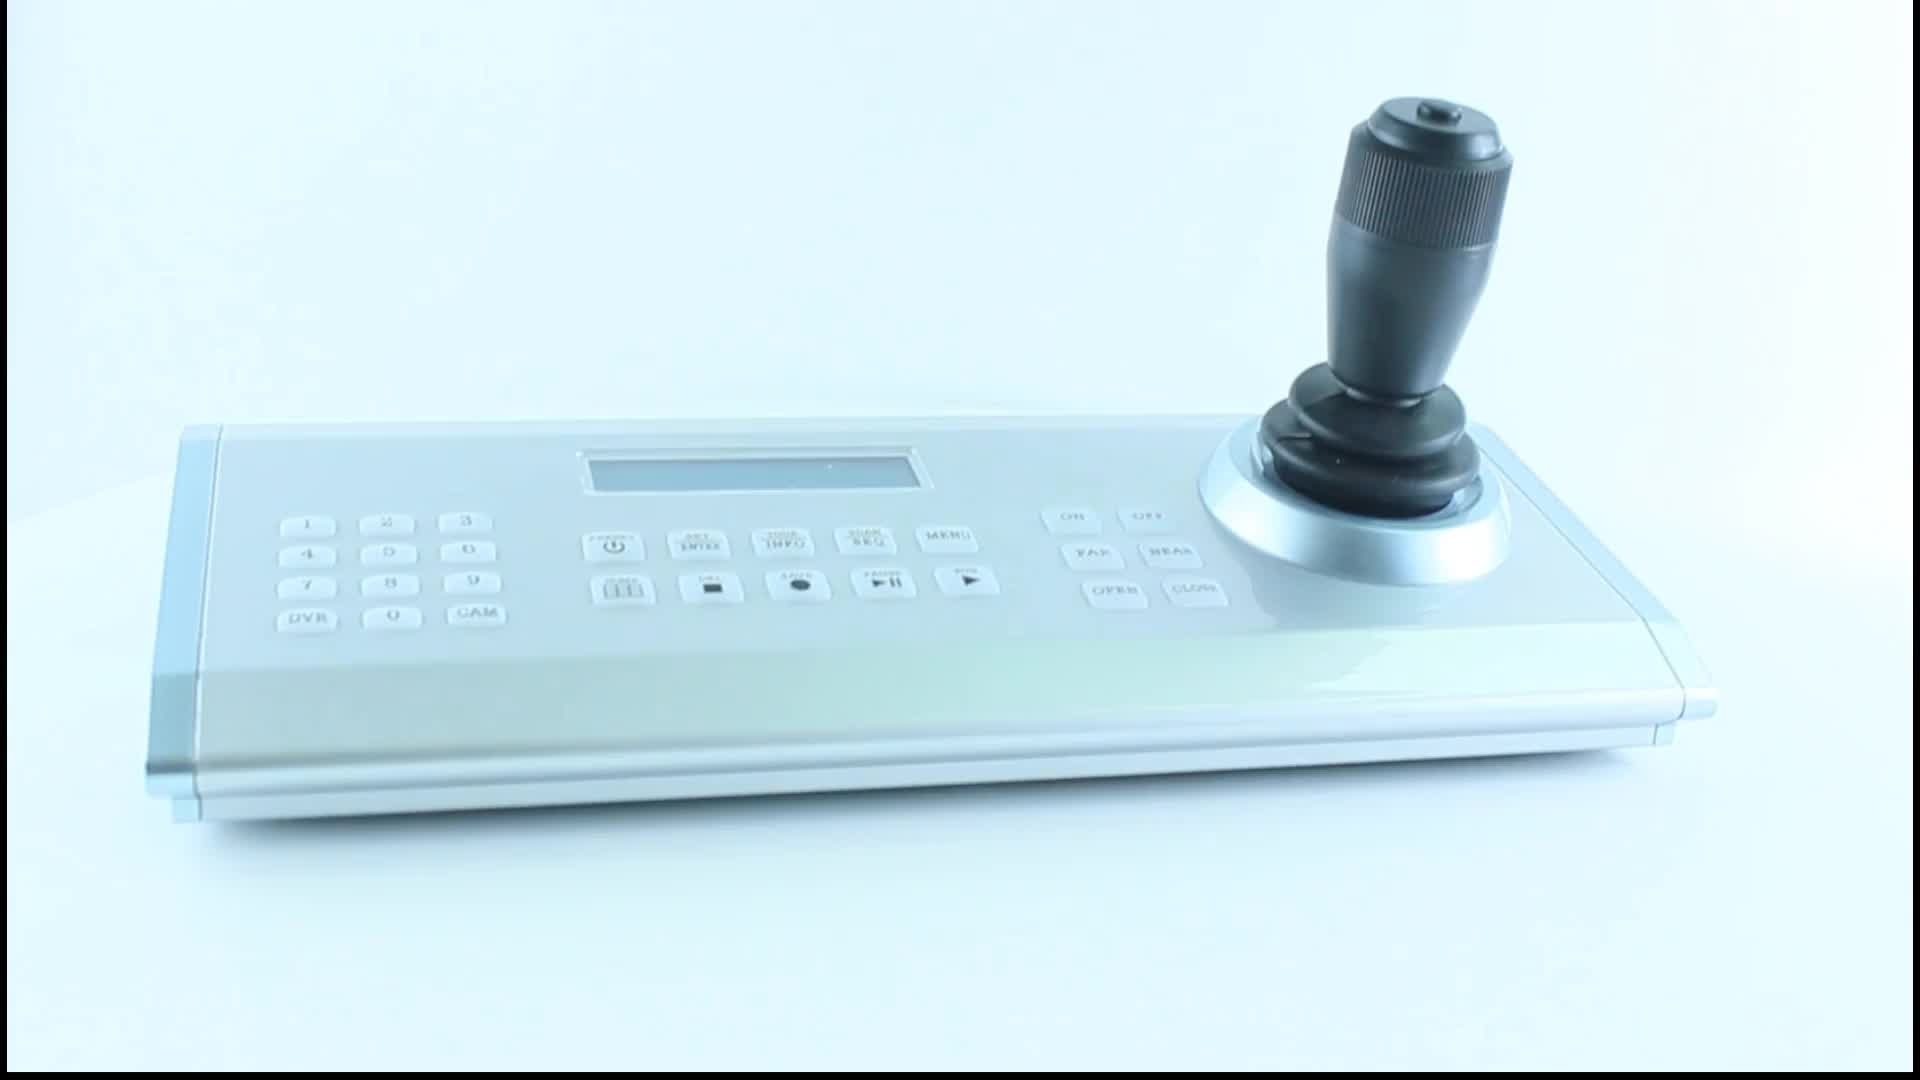 IGEECOO-ذراع التحكم في الكاميرا الروبوتية